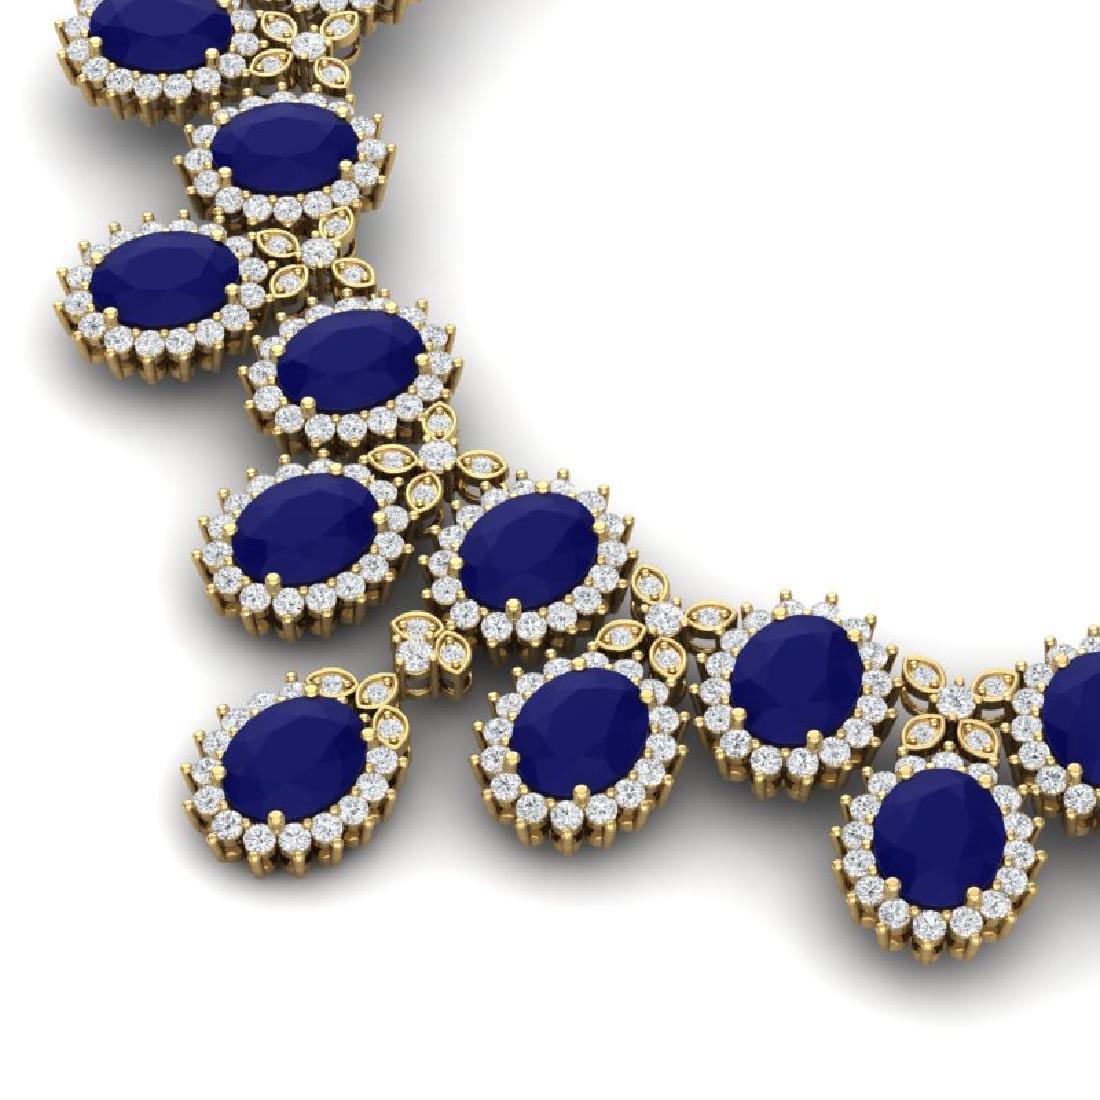 81 CTW Royalty Sapphire & VS Diamond Necklace 18K - 2